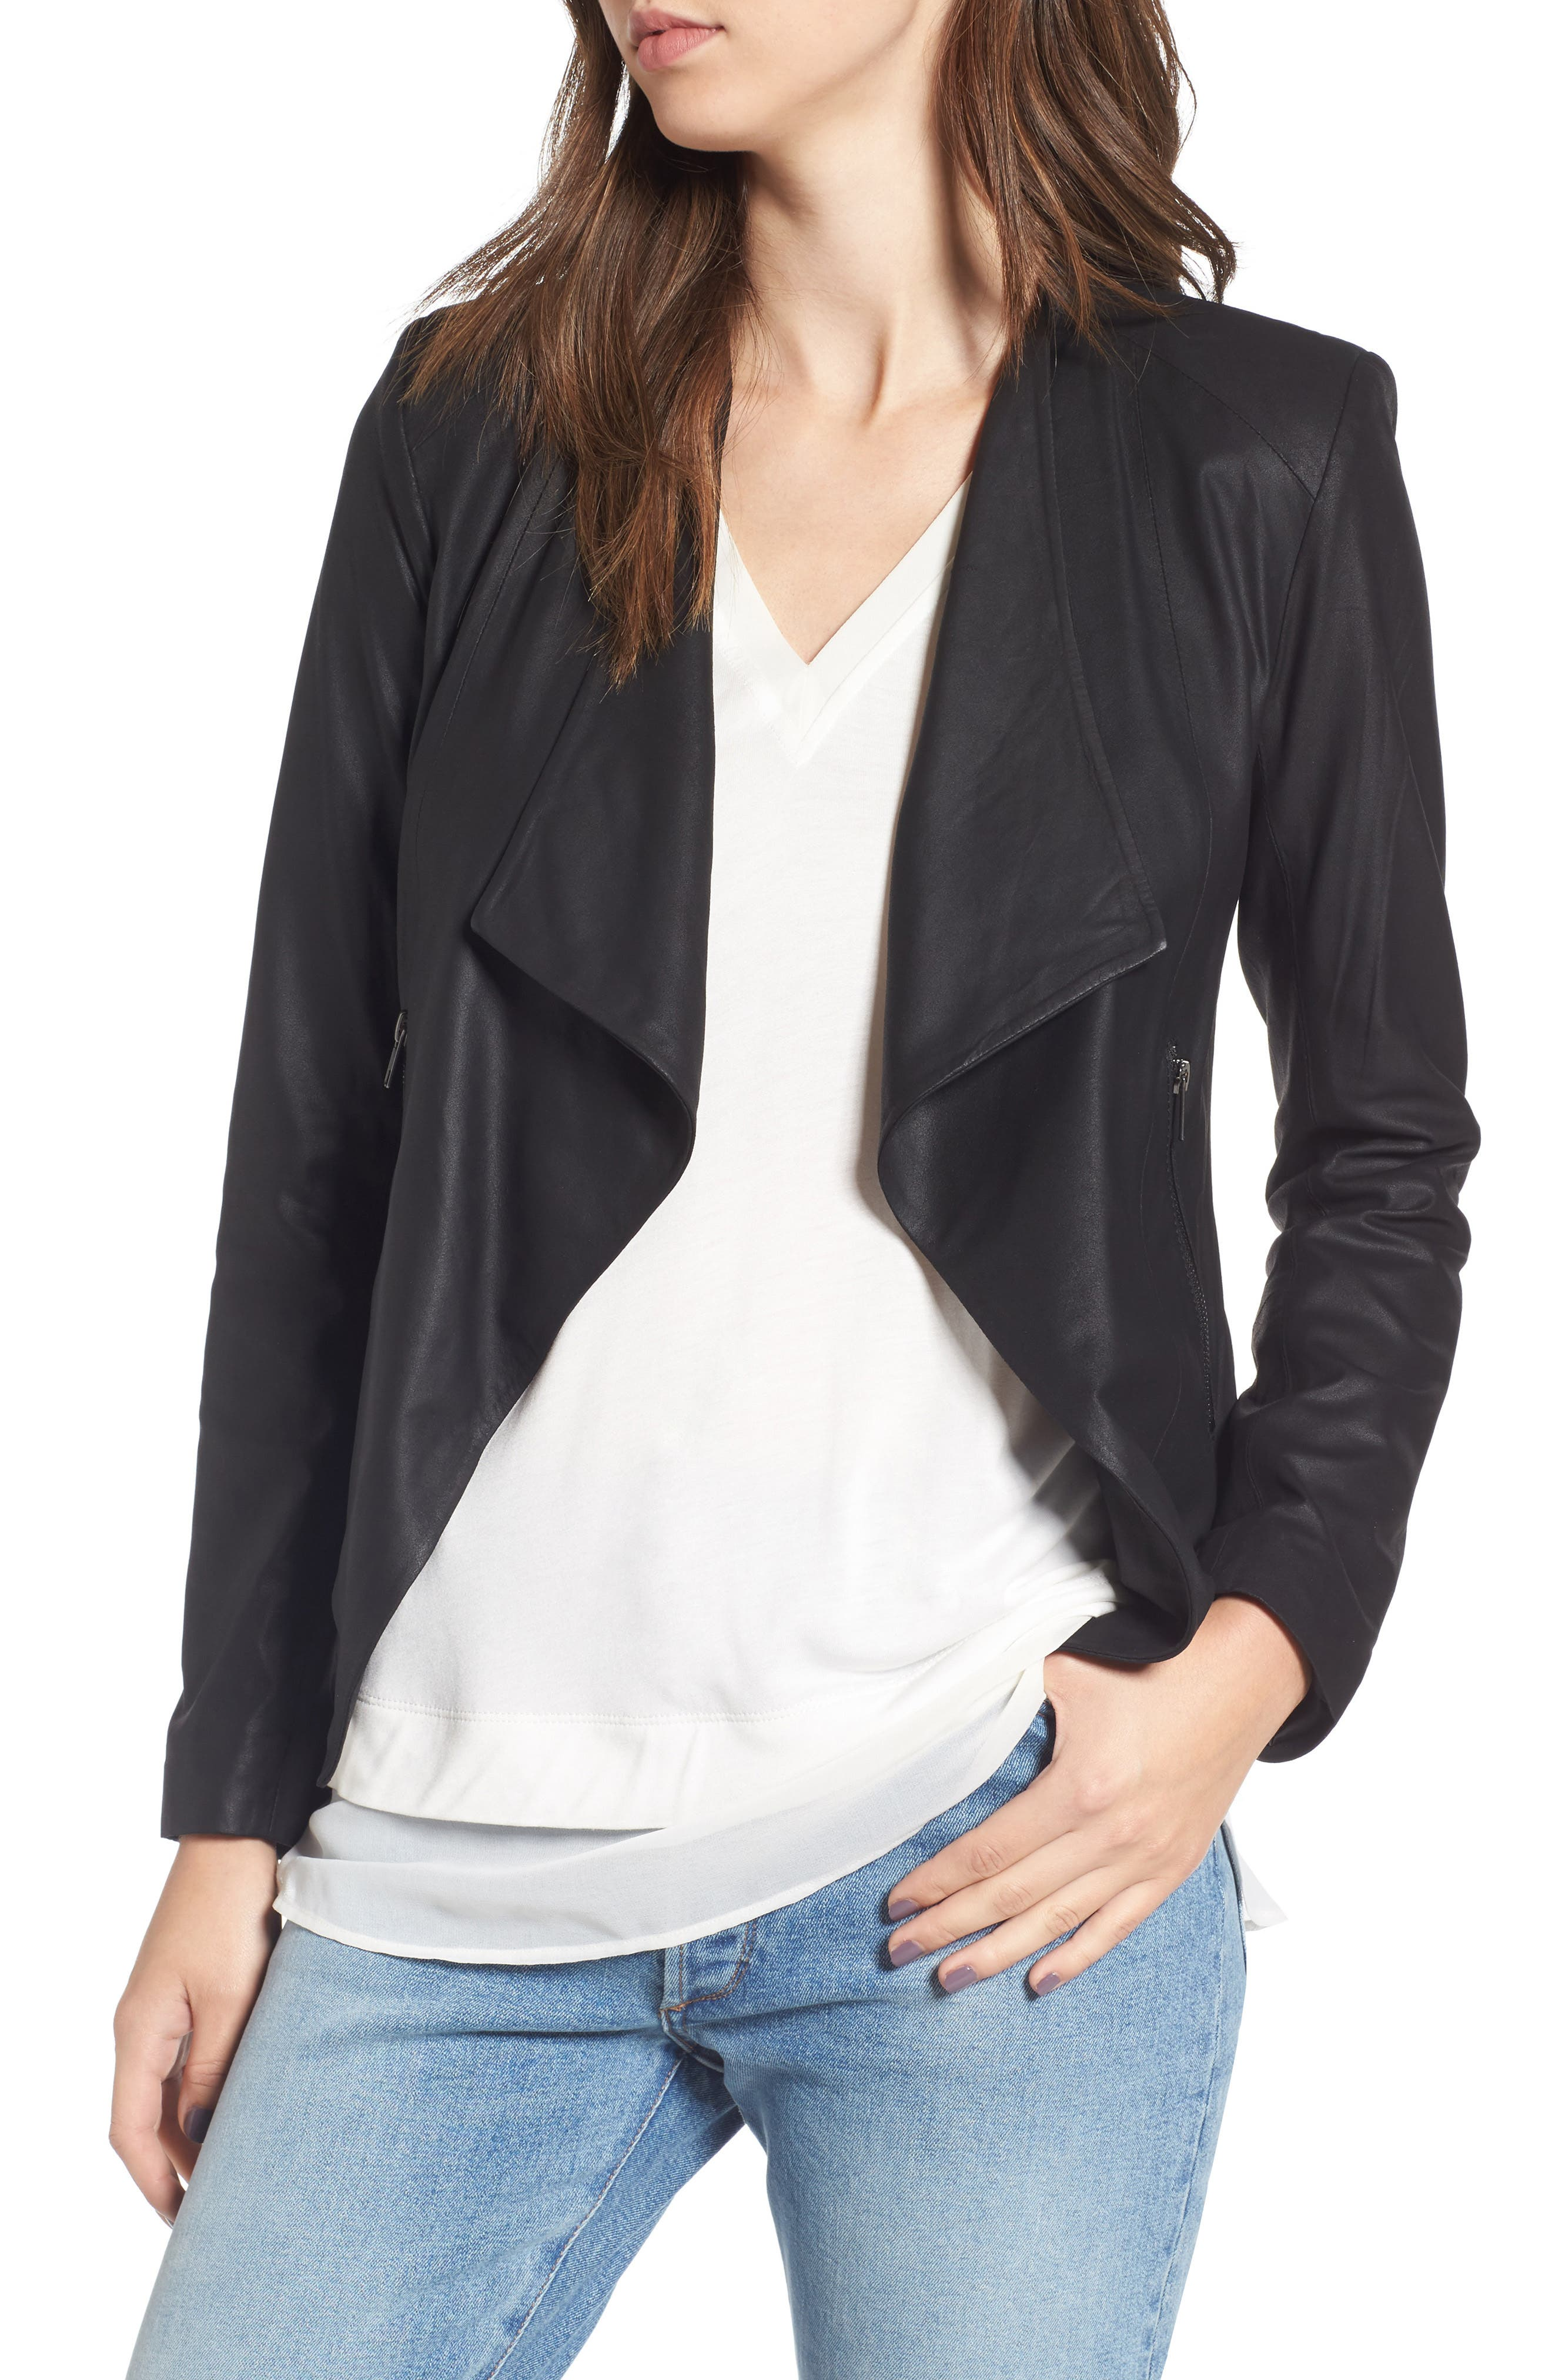 Brycen Leather Drape Front Jacket,                             Main thumbnail 1, color,                             001